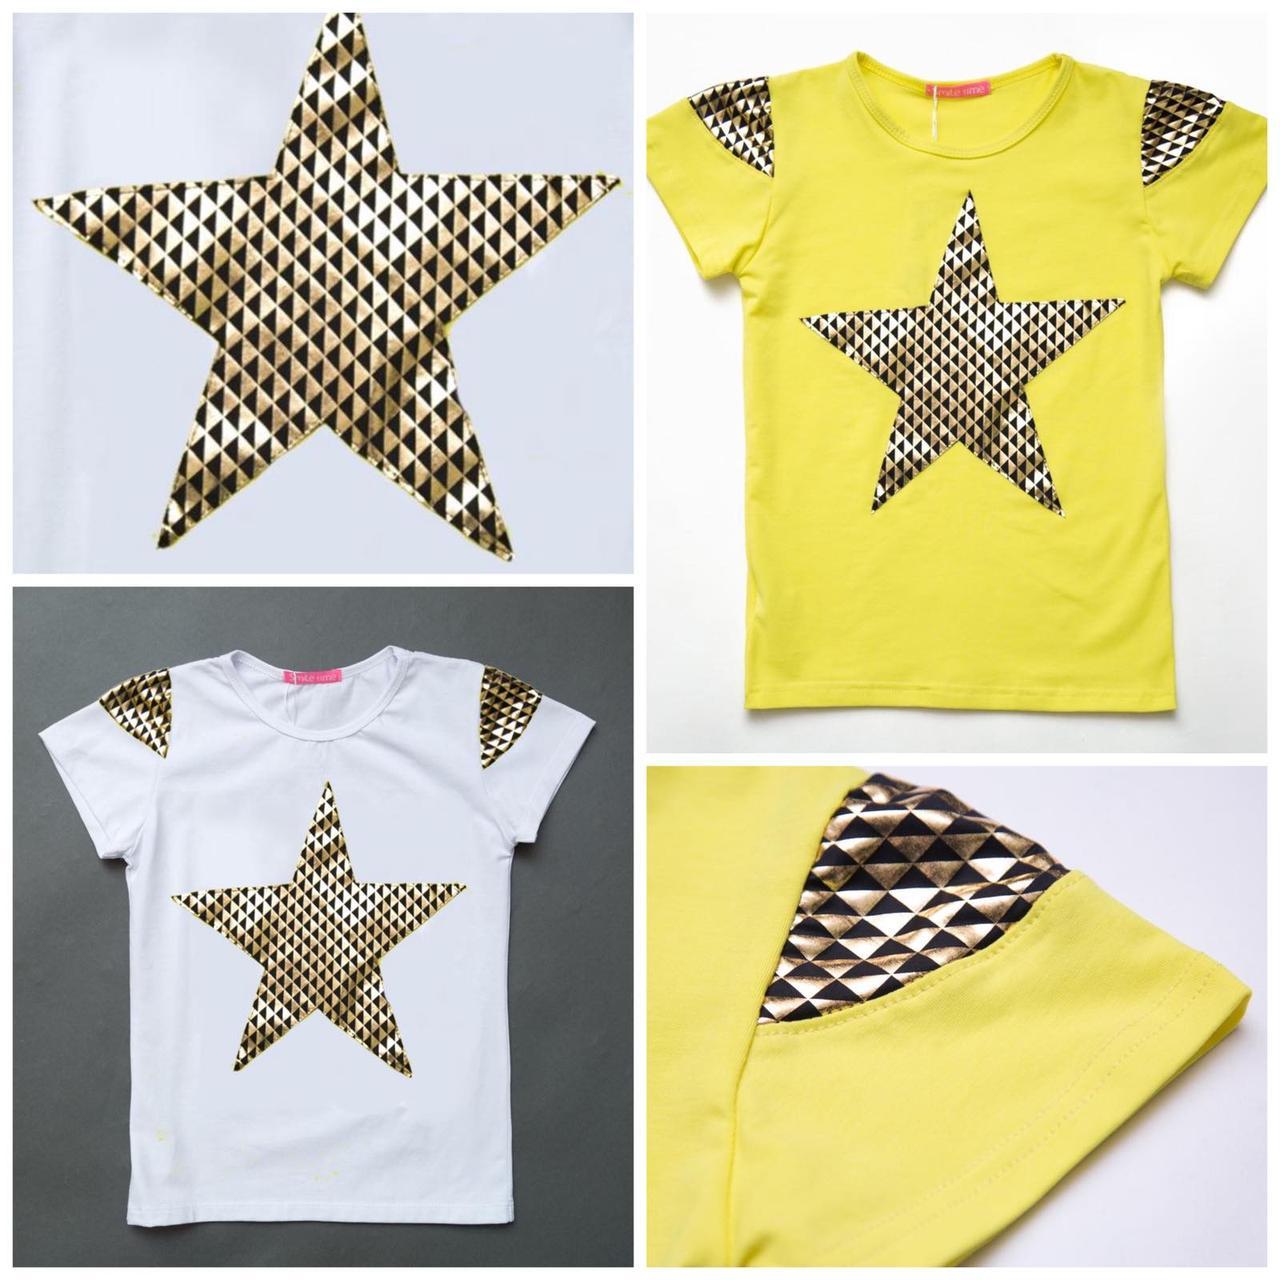 Летняя футболка для девочки Shining star, белая, желтая